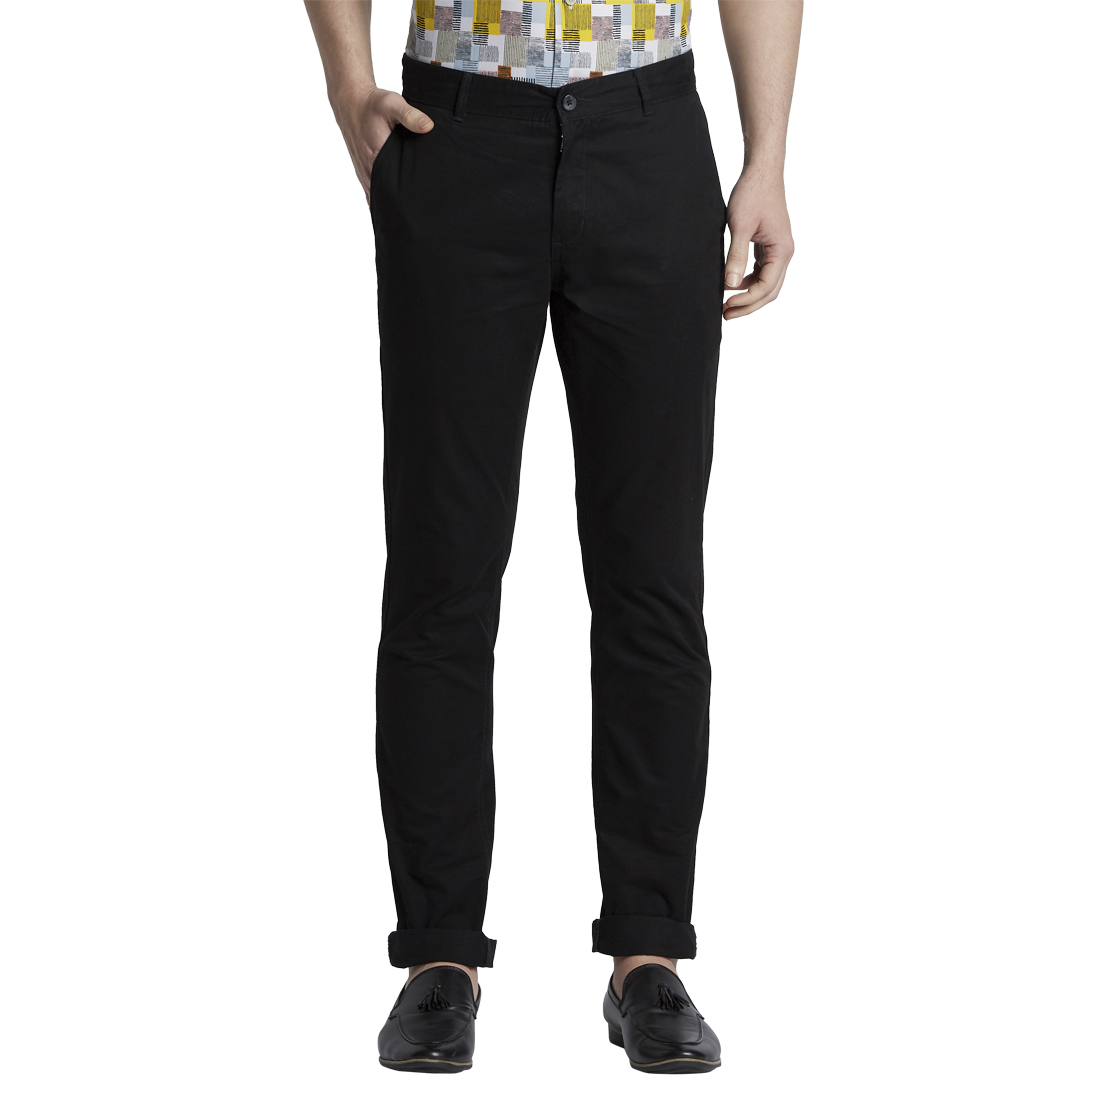 ColorPlus | ColorPlus Black Trouser